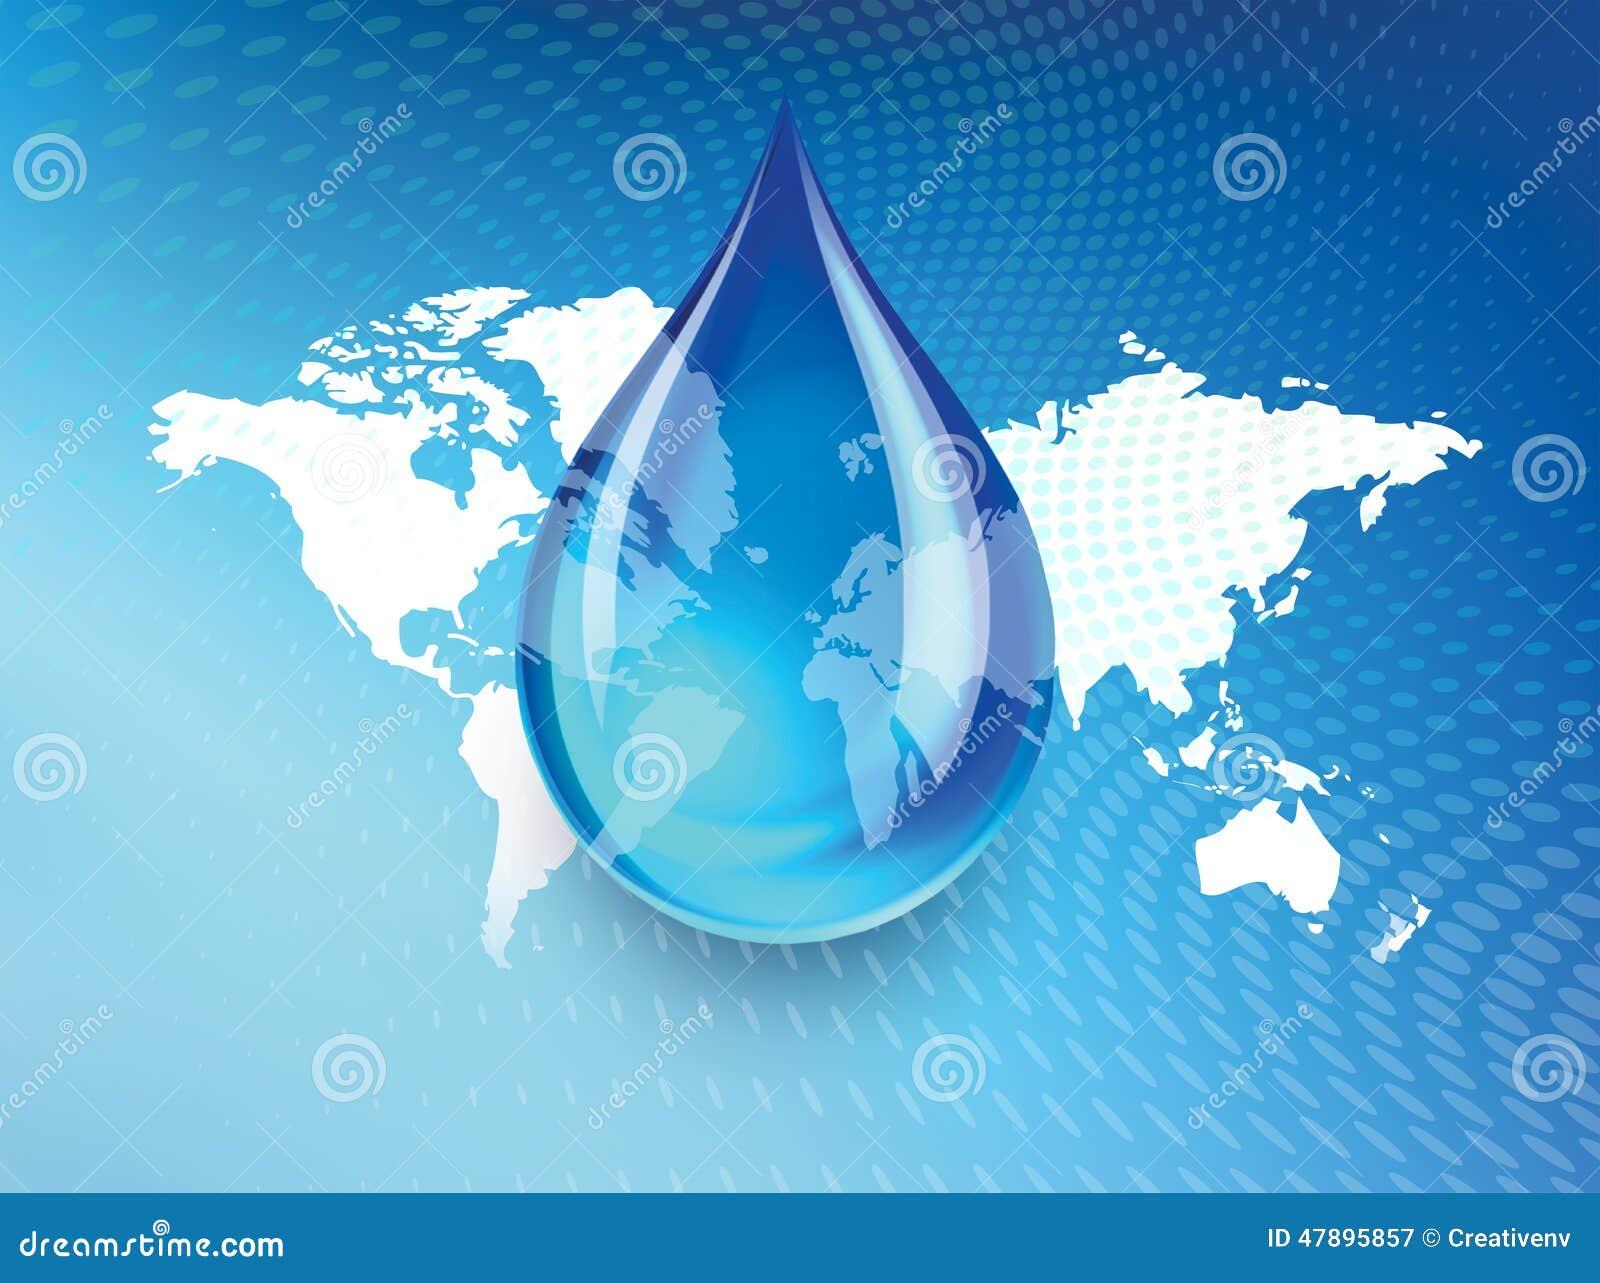 Water Drought Clip Art